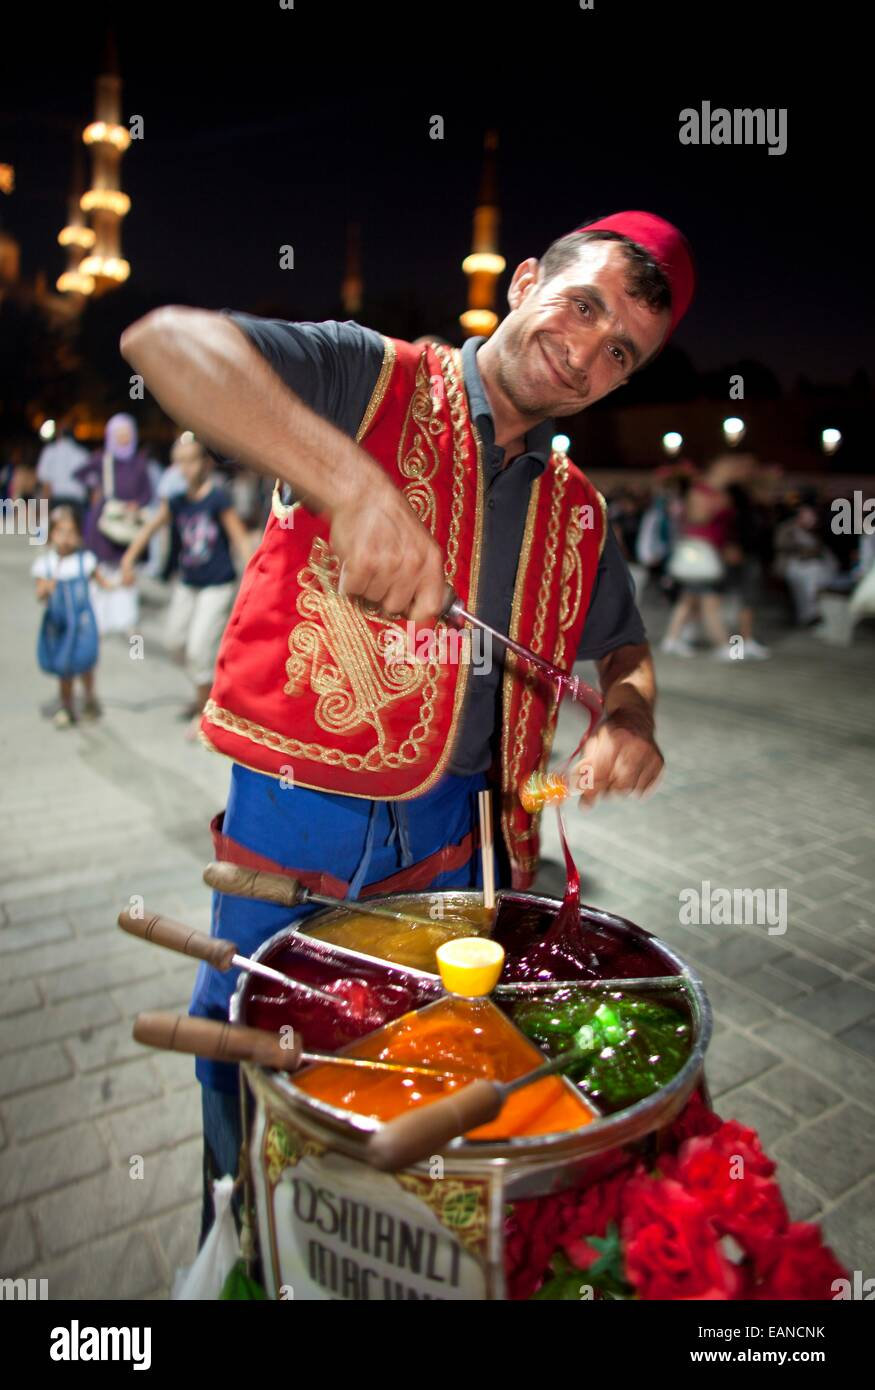 Vendeur de rue, la vente de bonbons, Istanbul Photo Stock